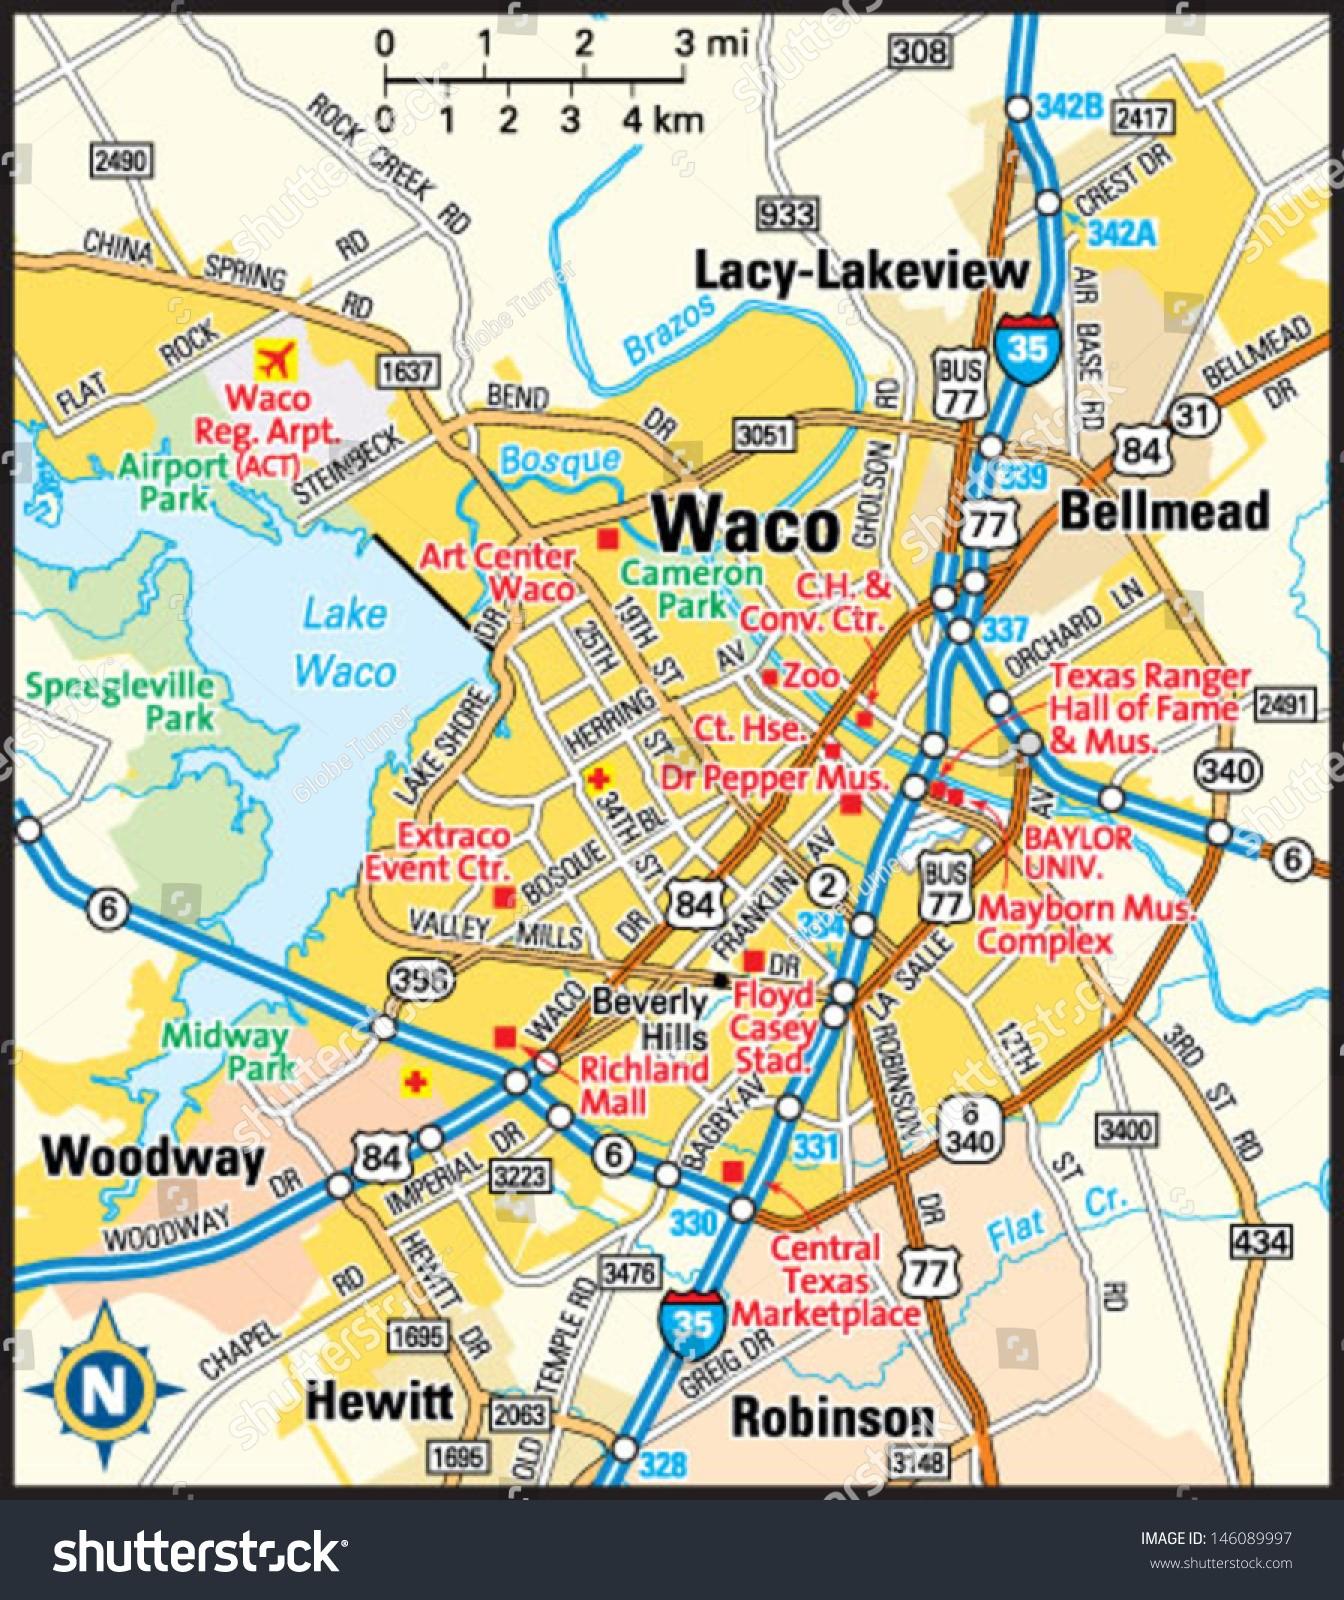 Txu Sanborn Waco 1889 01 17 Waco Texas Map   Settoplinux - Google Maps Waco Texas